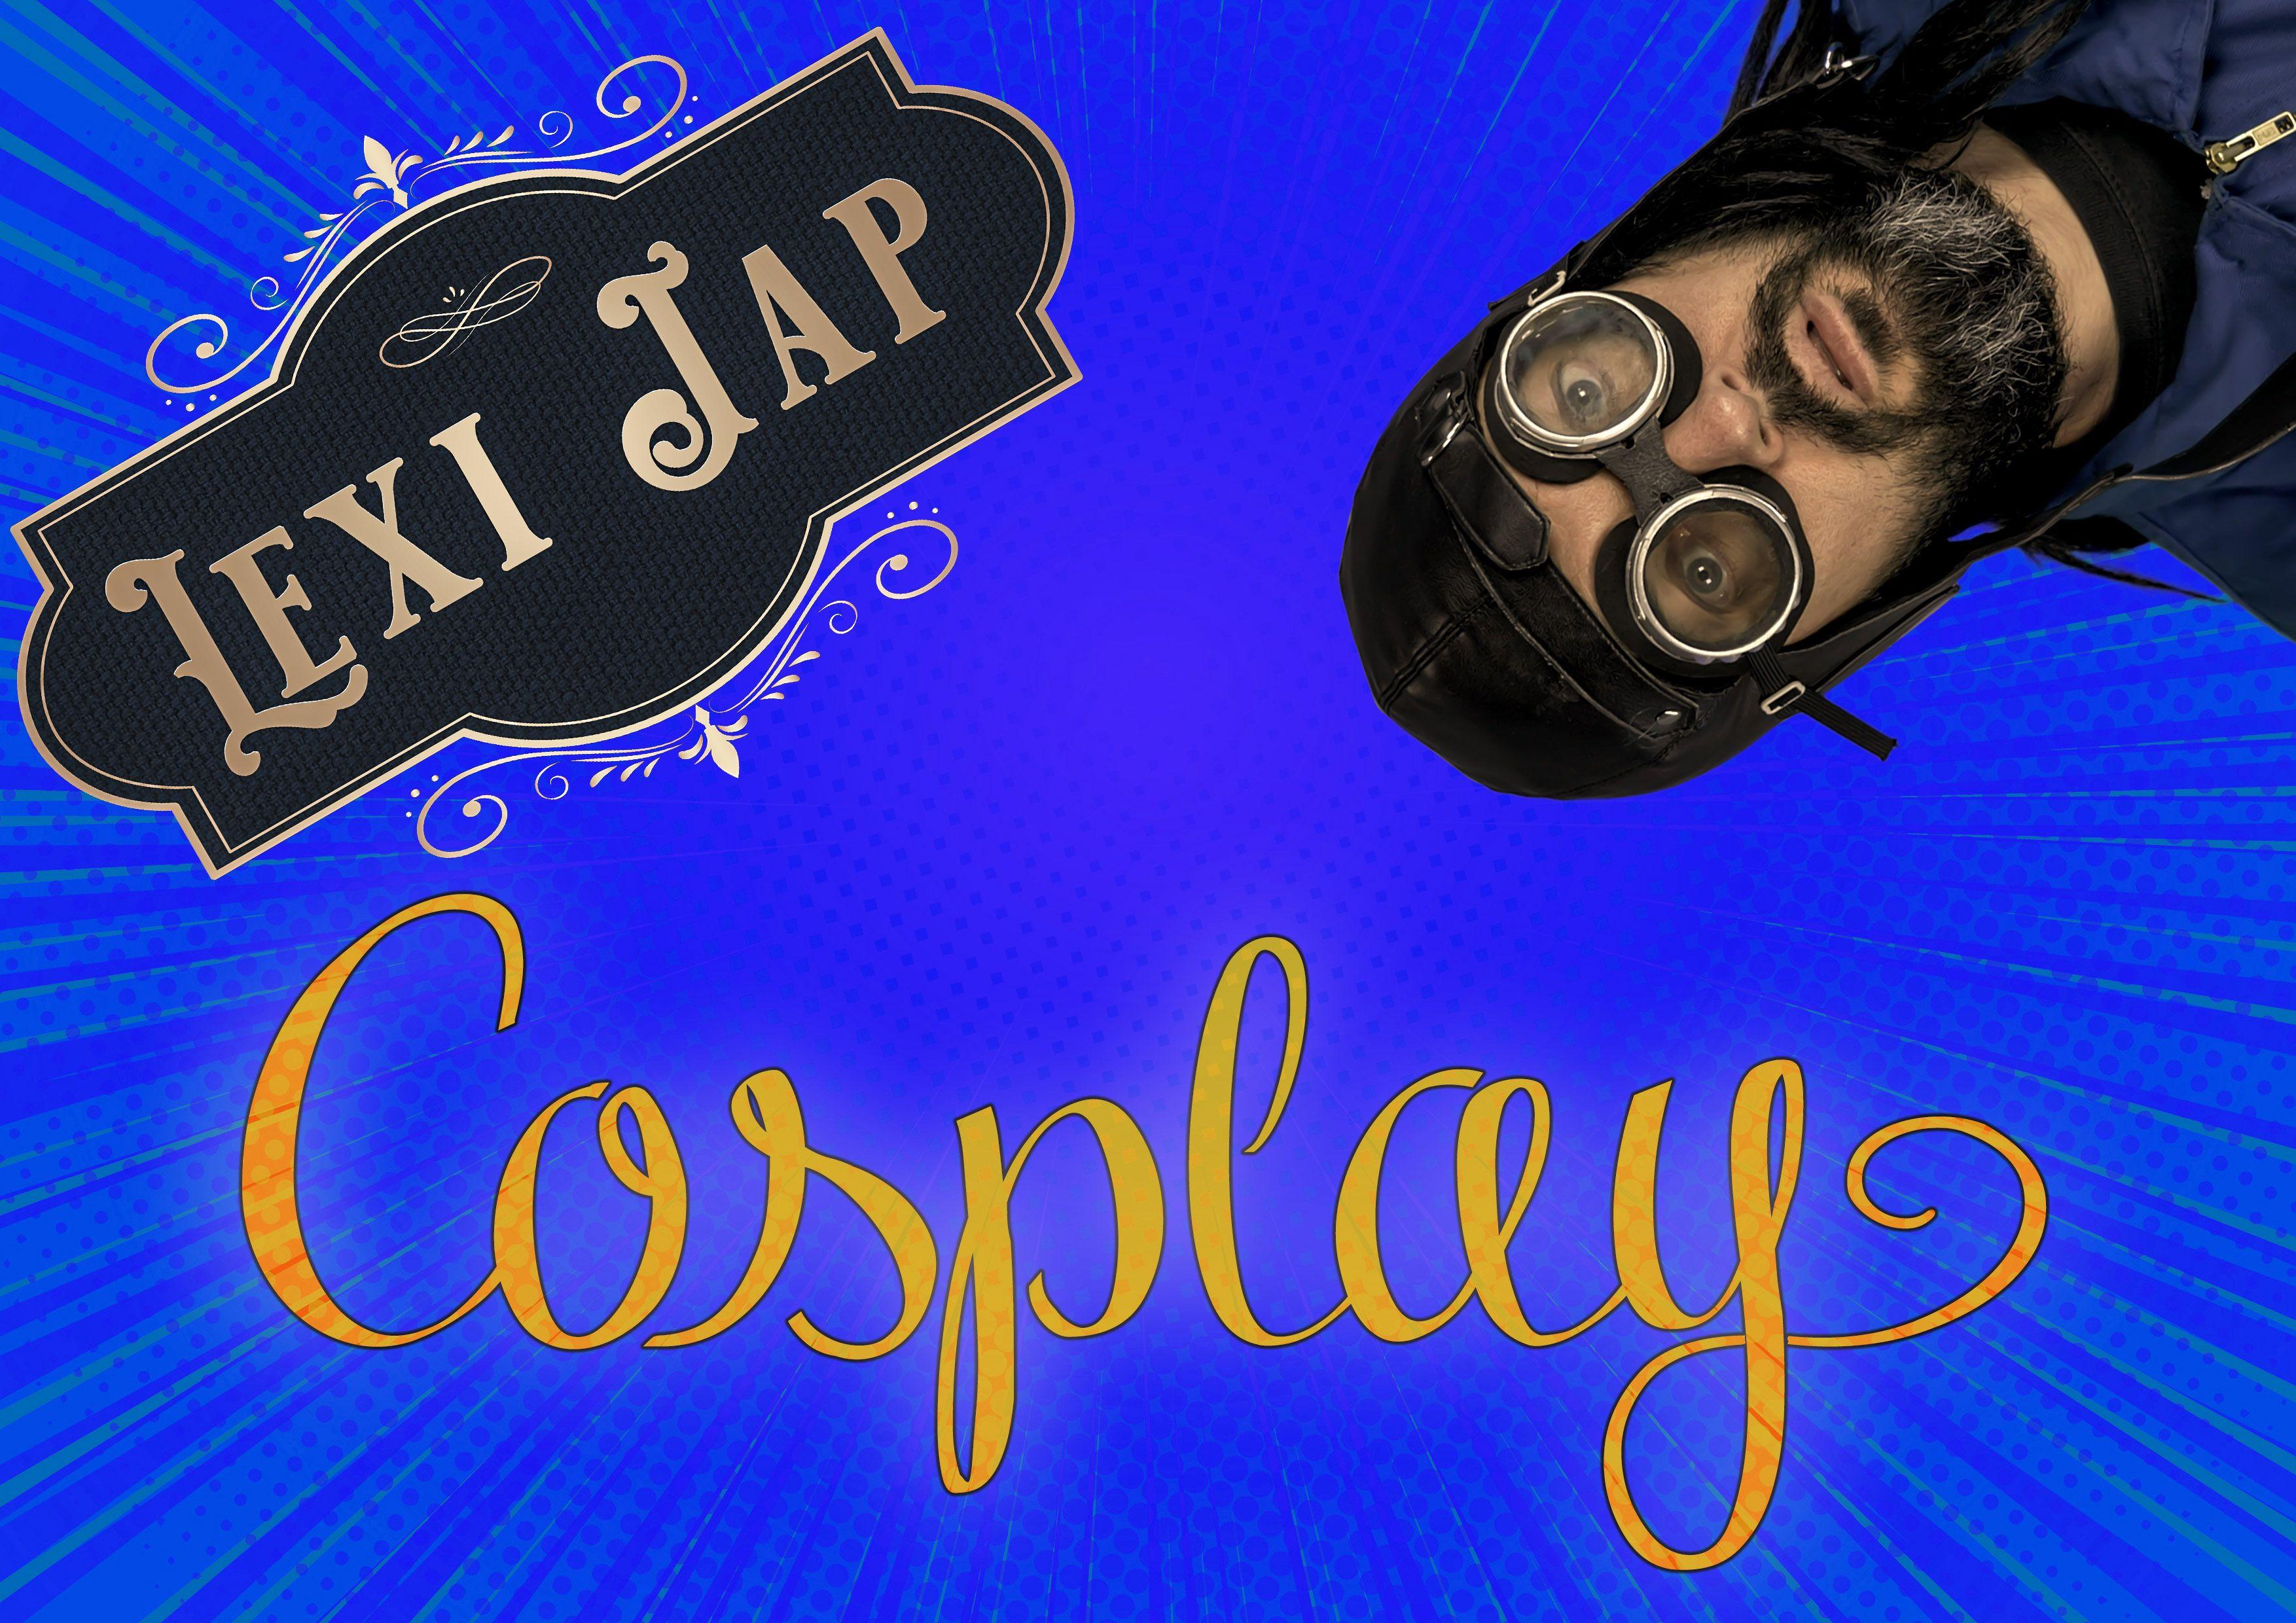 LexiJap-Cosplay.jpg